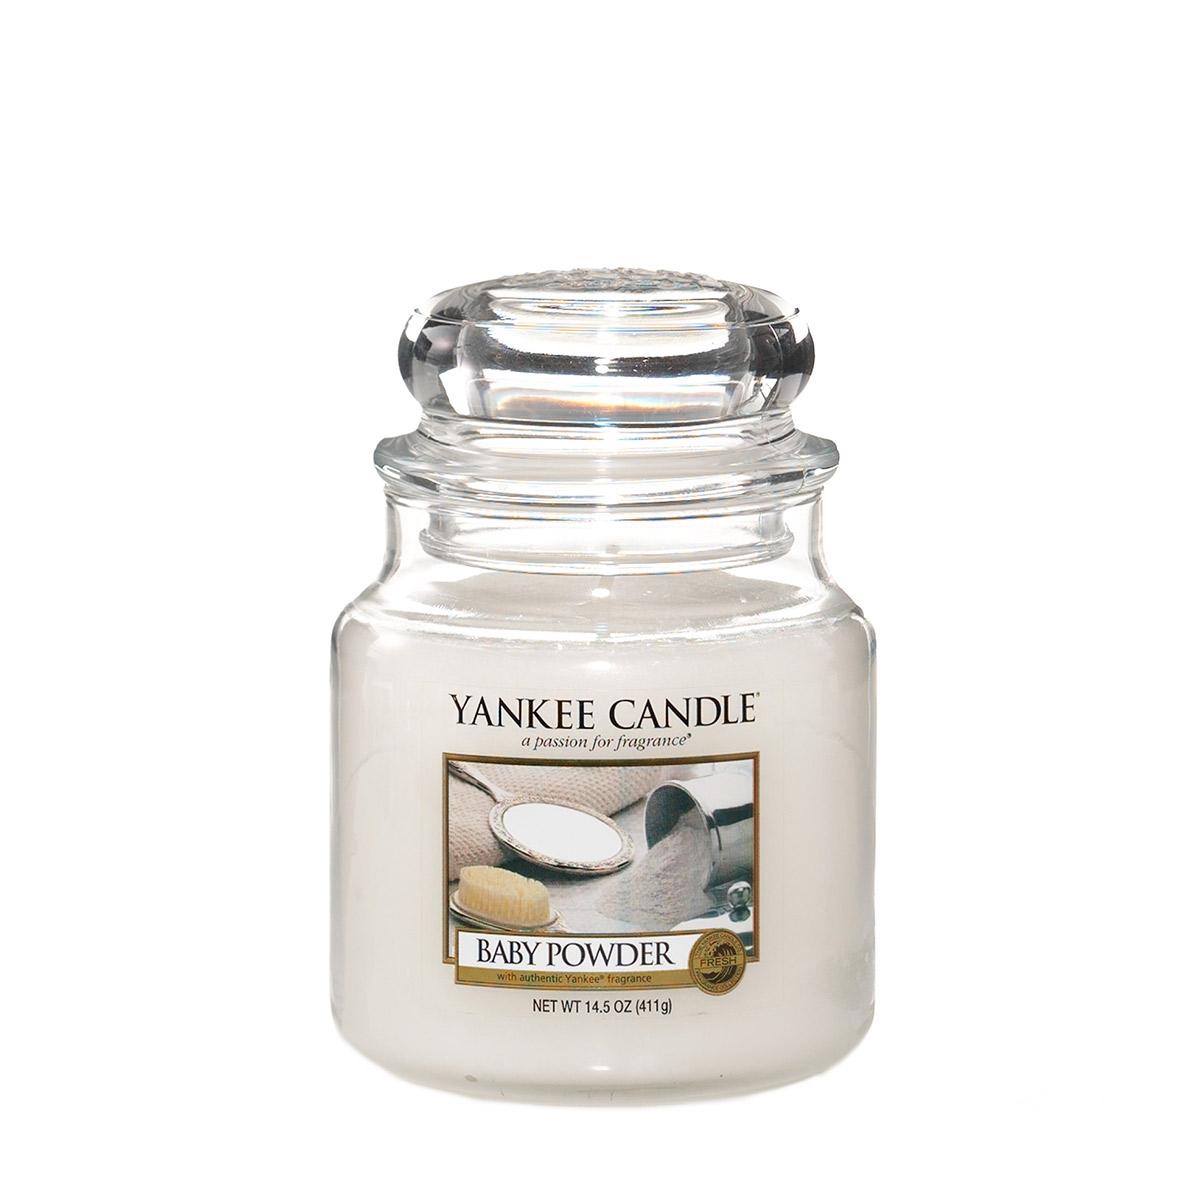 Yankee Candle Jar Medium Baby Powder